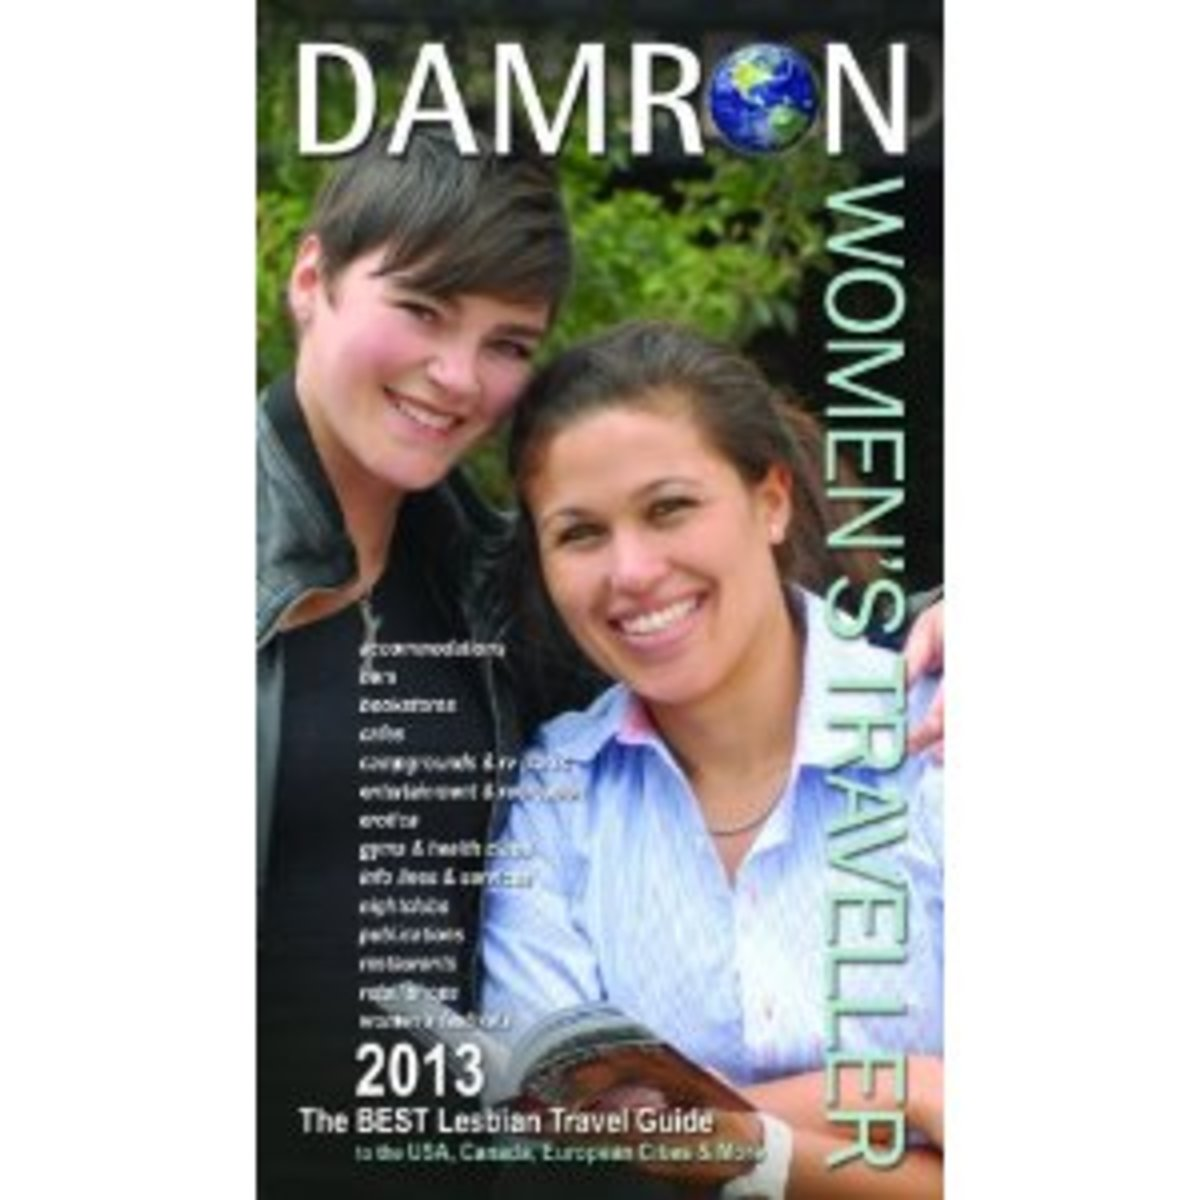 Damron Lesbian Travel Guide